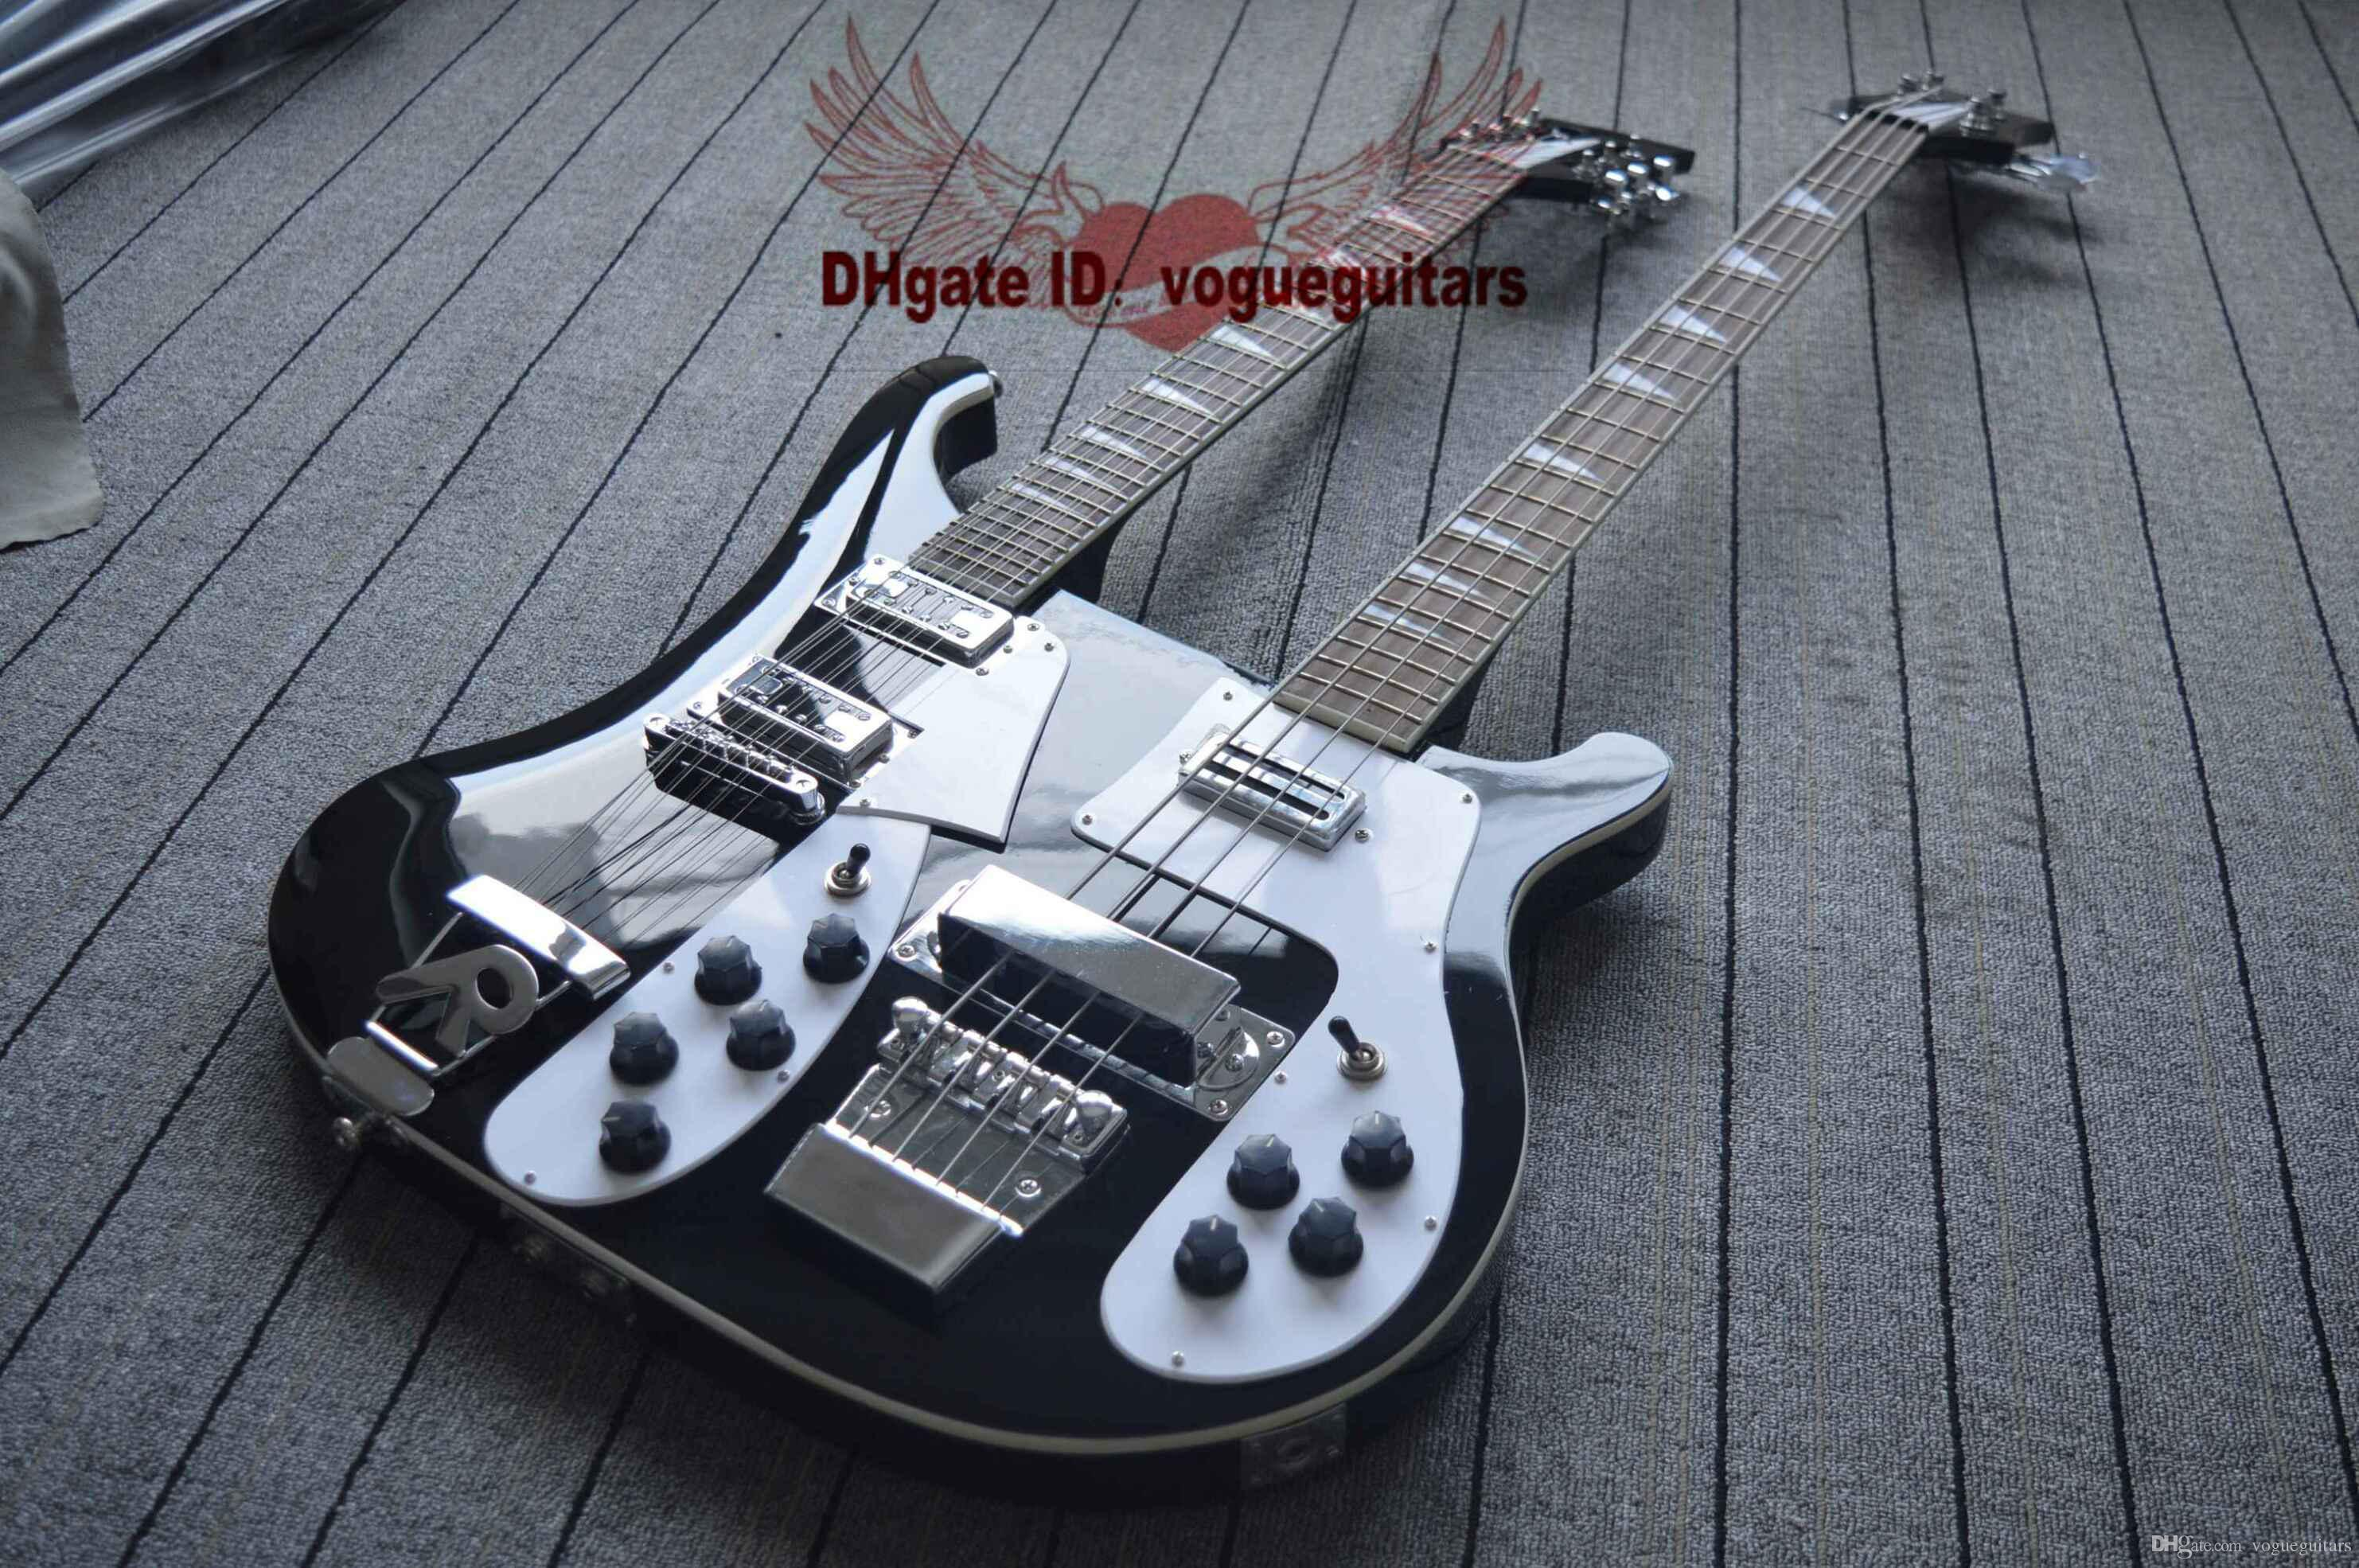 6e434a22acc8 Compre Negro Nuevo Double Neck 4 Cuerdas Guitarra Eléctrica Y 12 Cuerdas  Guitarra Eléctrica Envío Gratis A $538.2 Del Vogueguitars | DHgate.Com